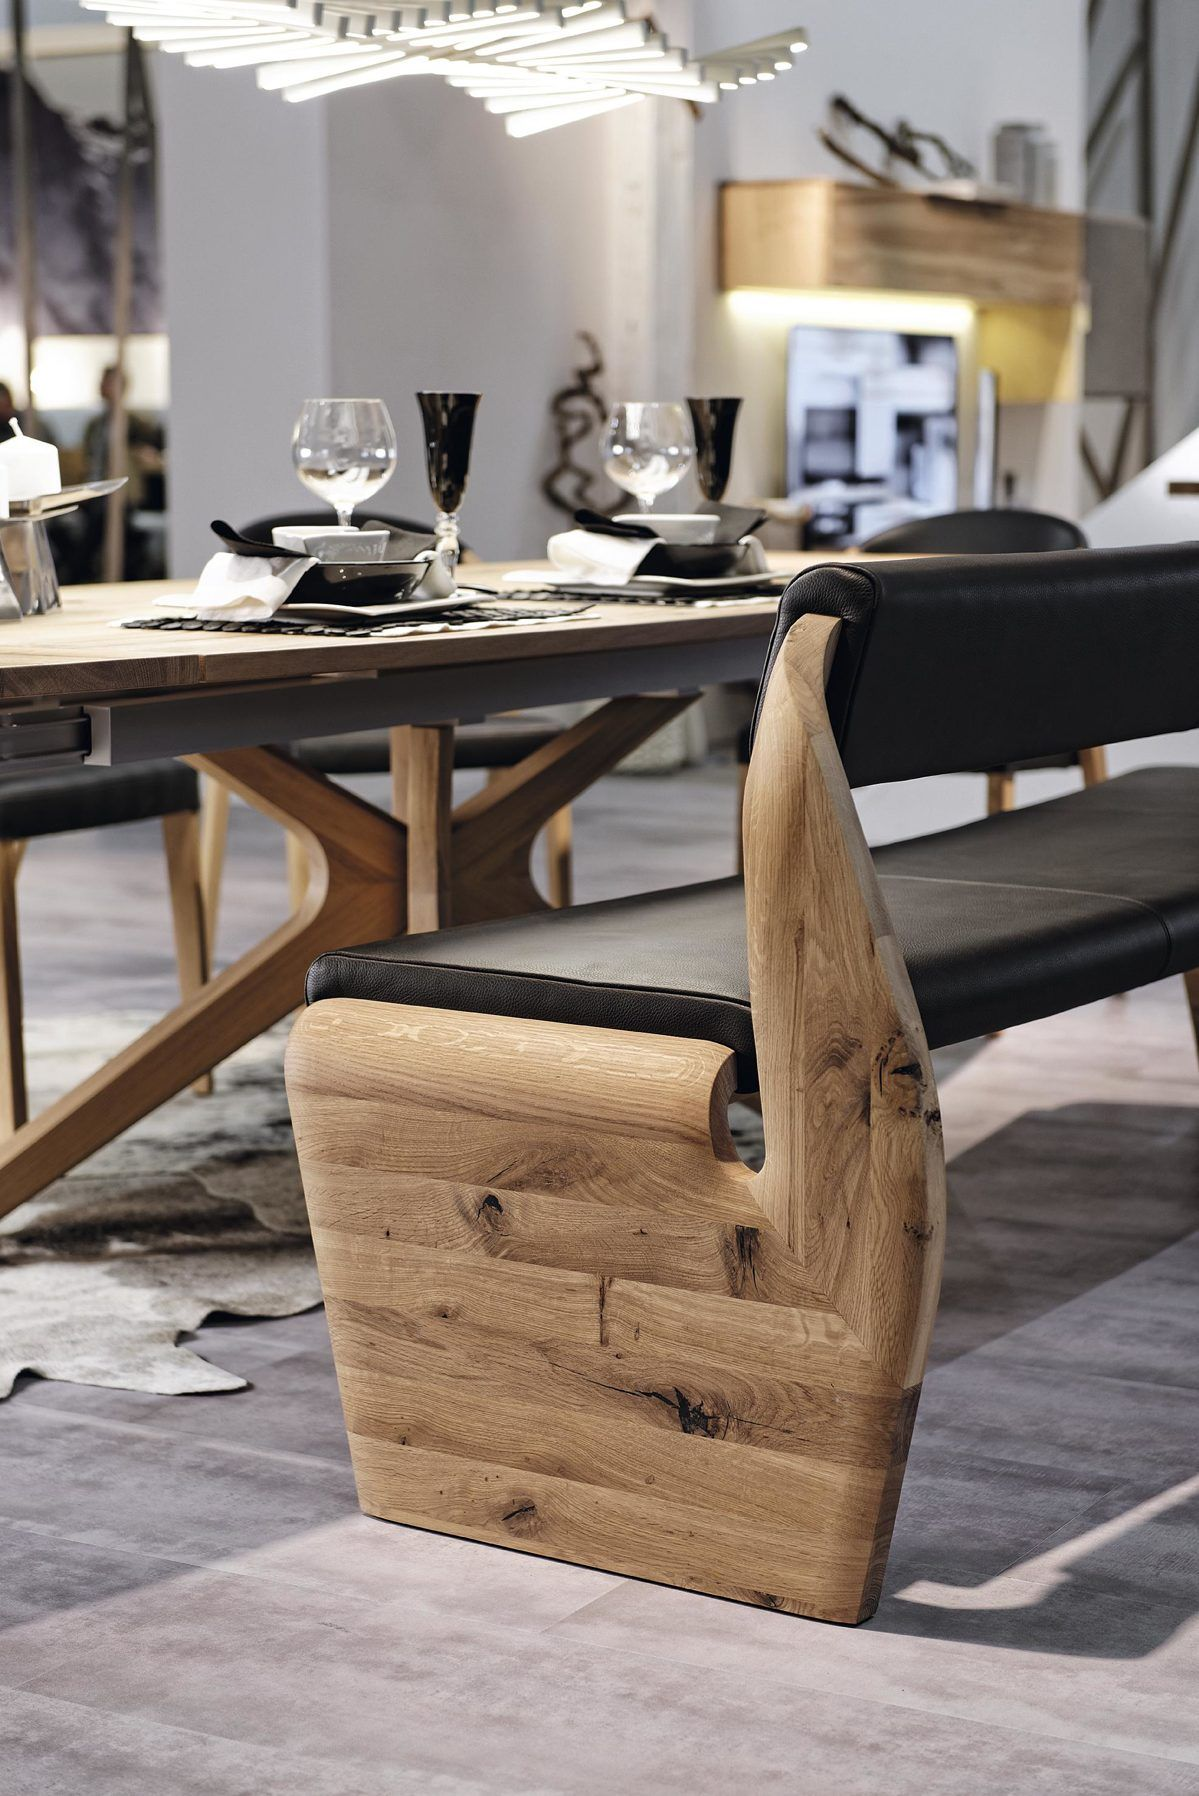 online shop produktdetails id1048221 moebel weber herxheim bei landau. Black Bedroom Furniture Sets. Home Design Ideas